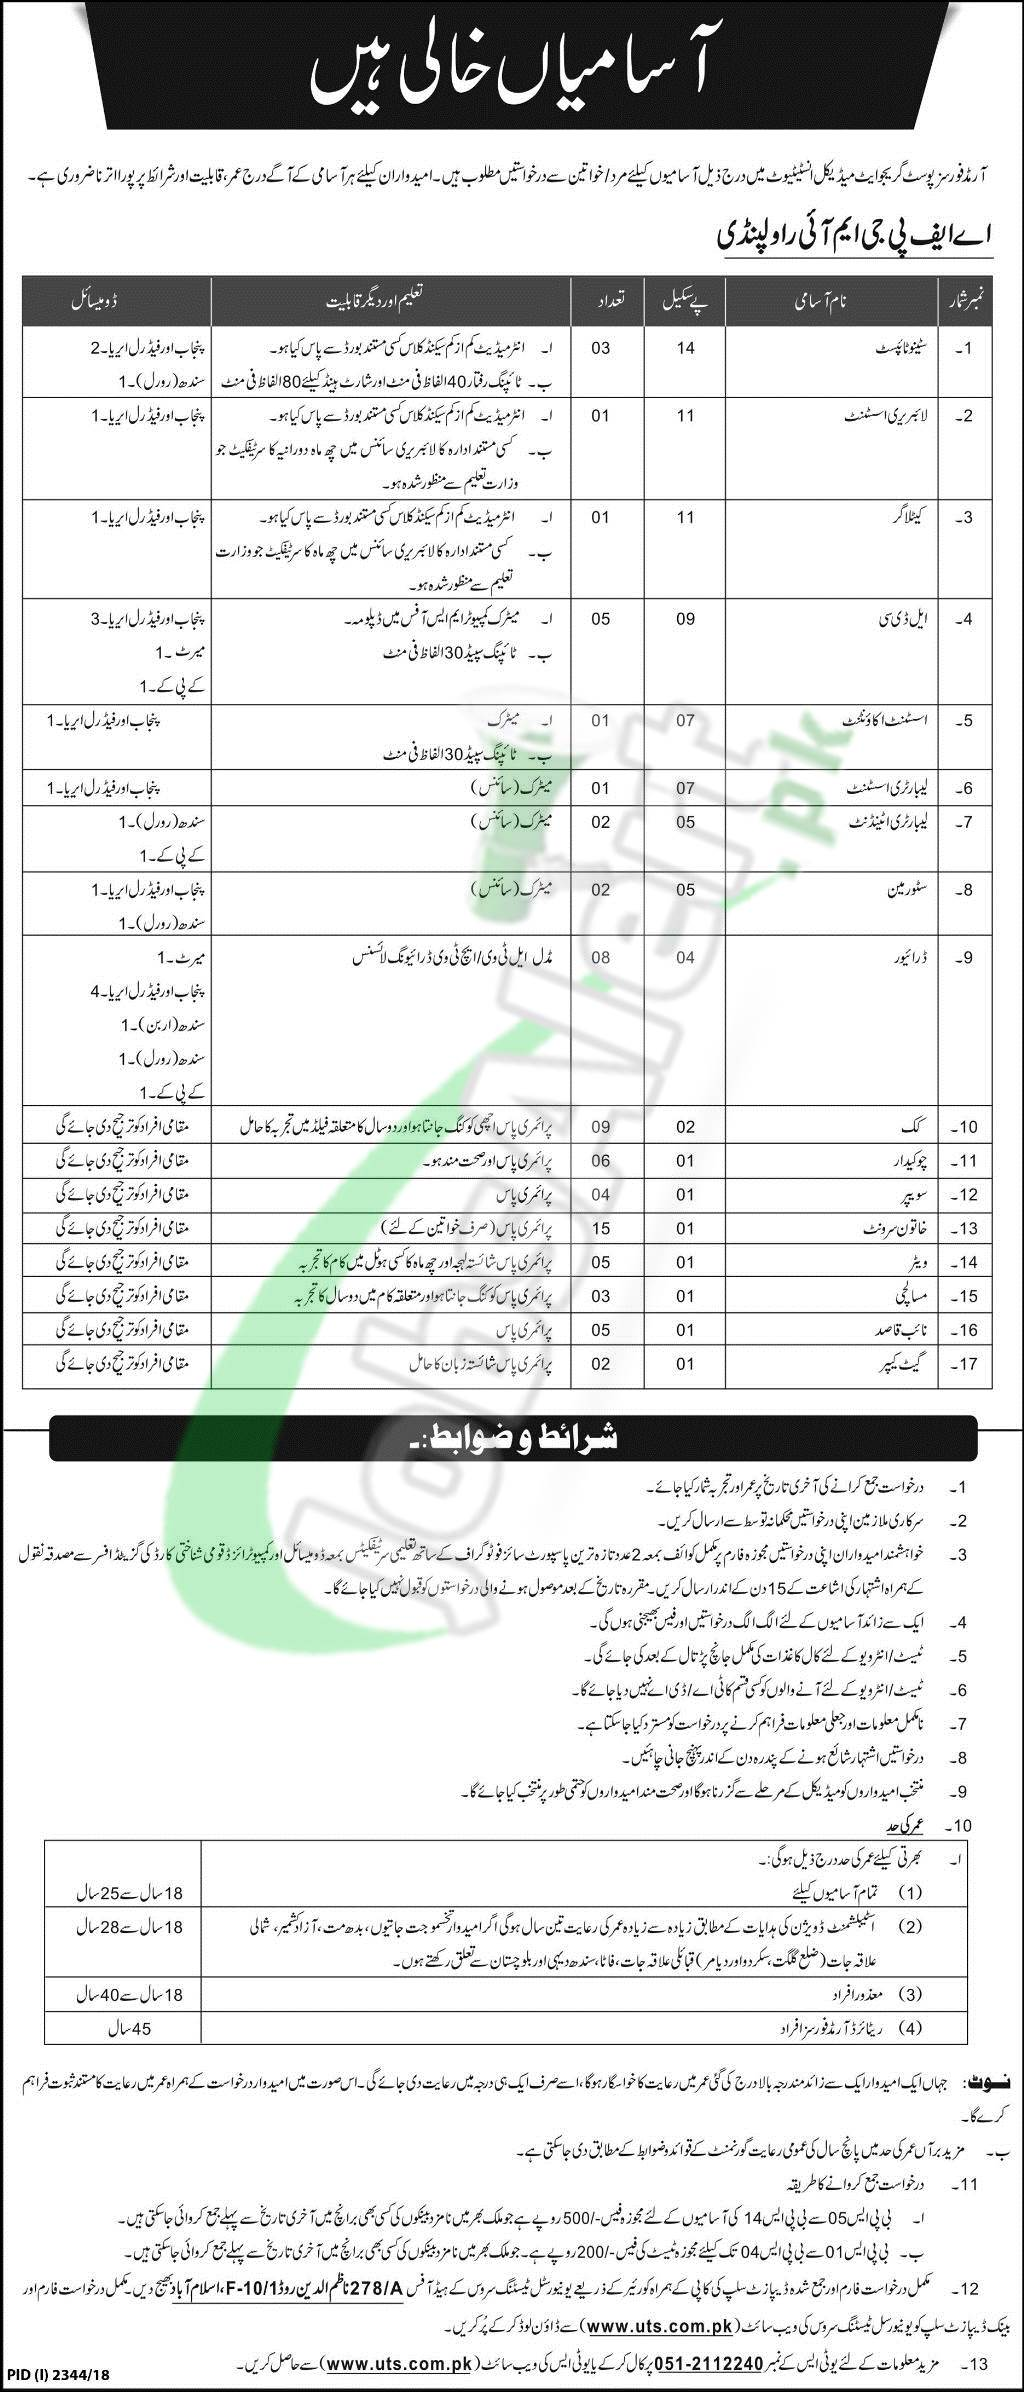 Armed Forces Postgraduate Medical Institute Rawalpindi Jobs